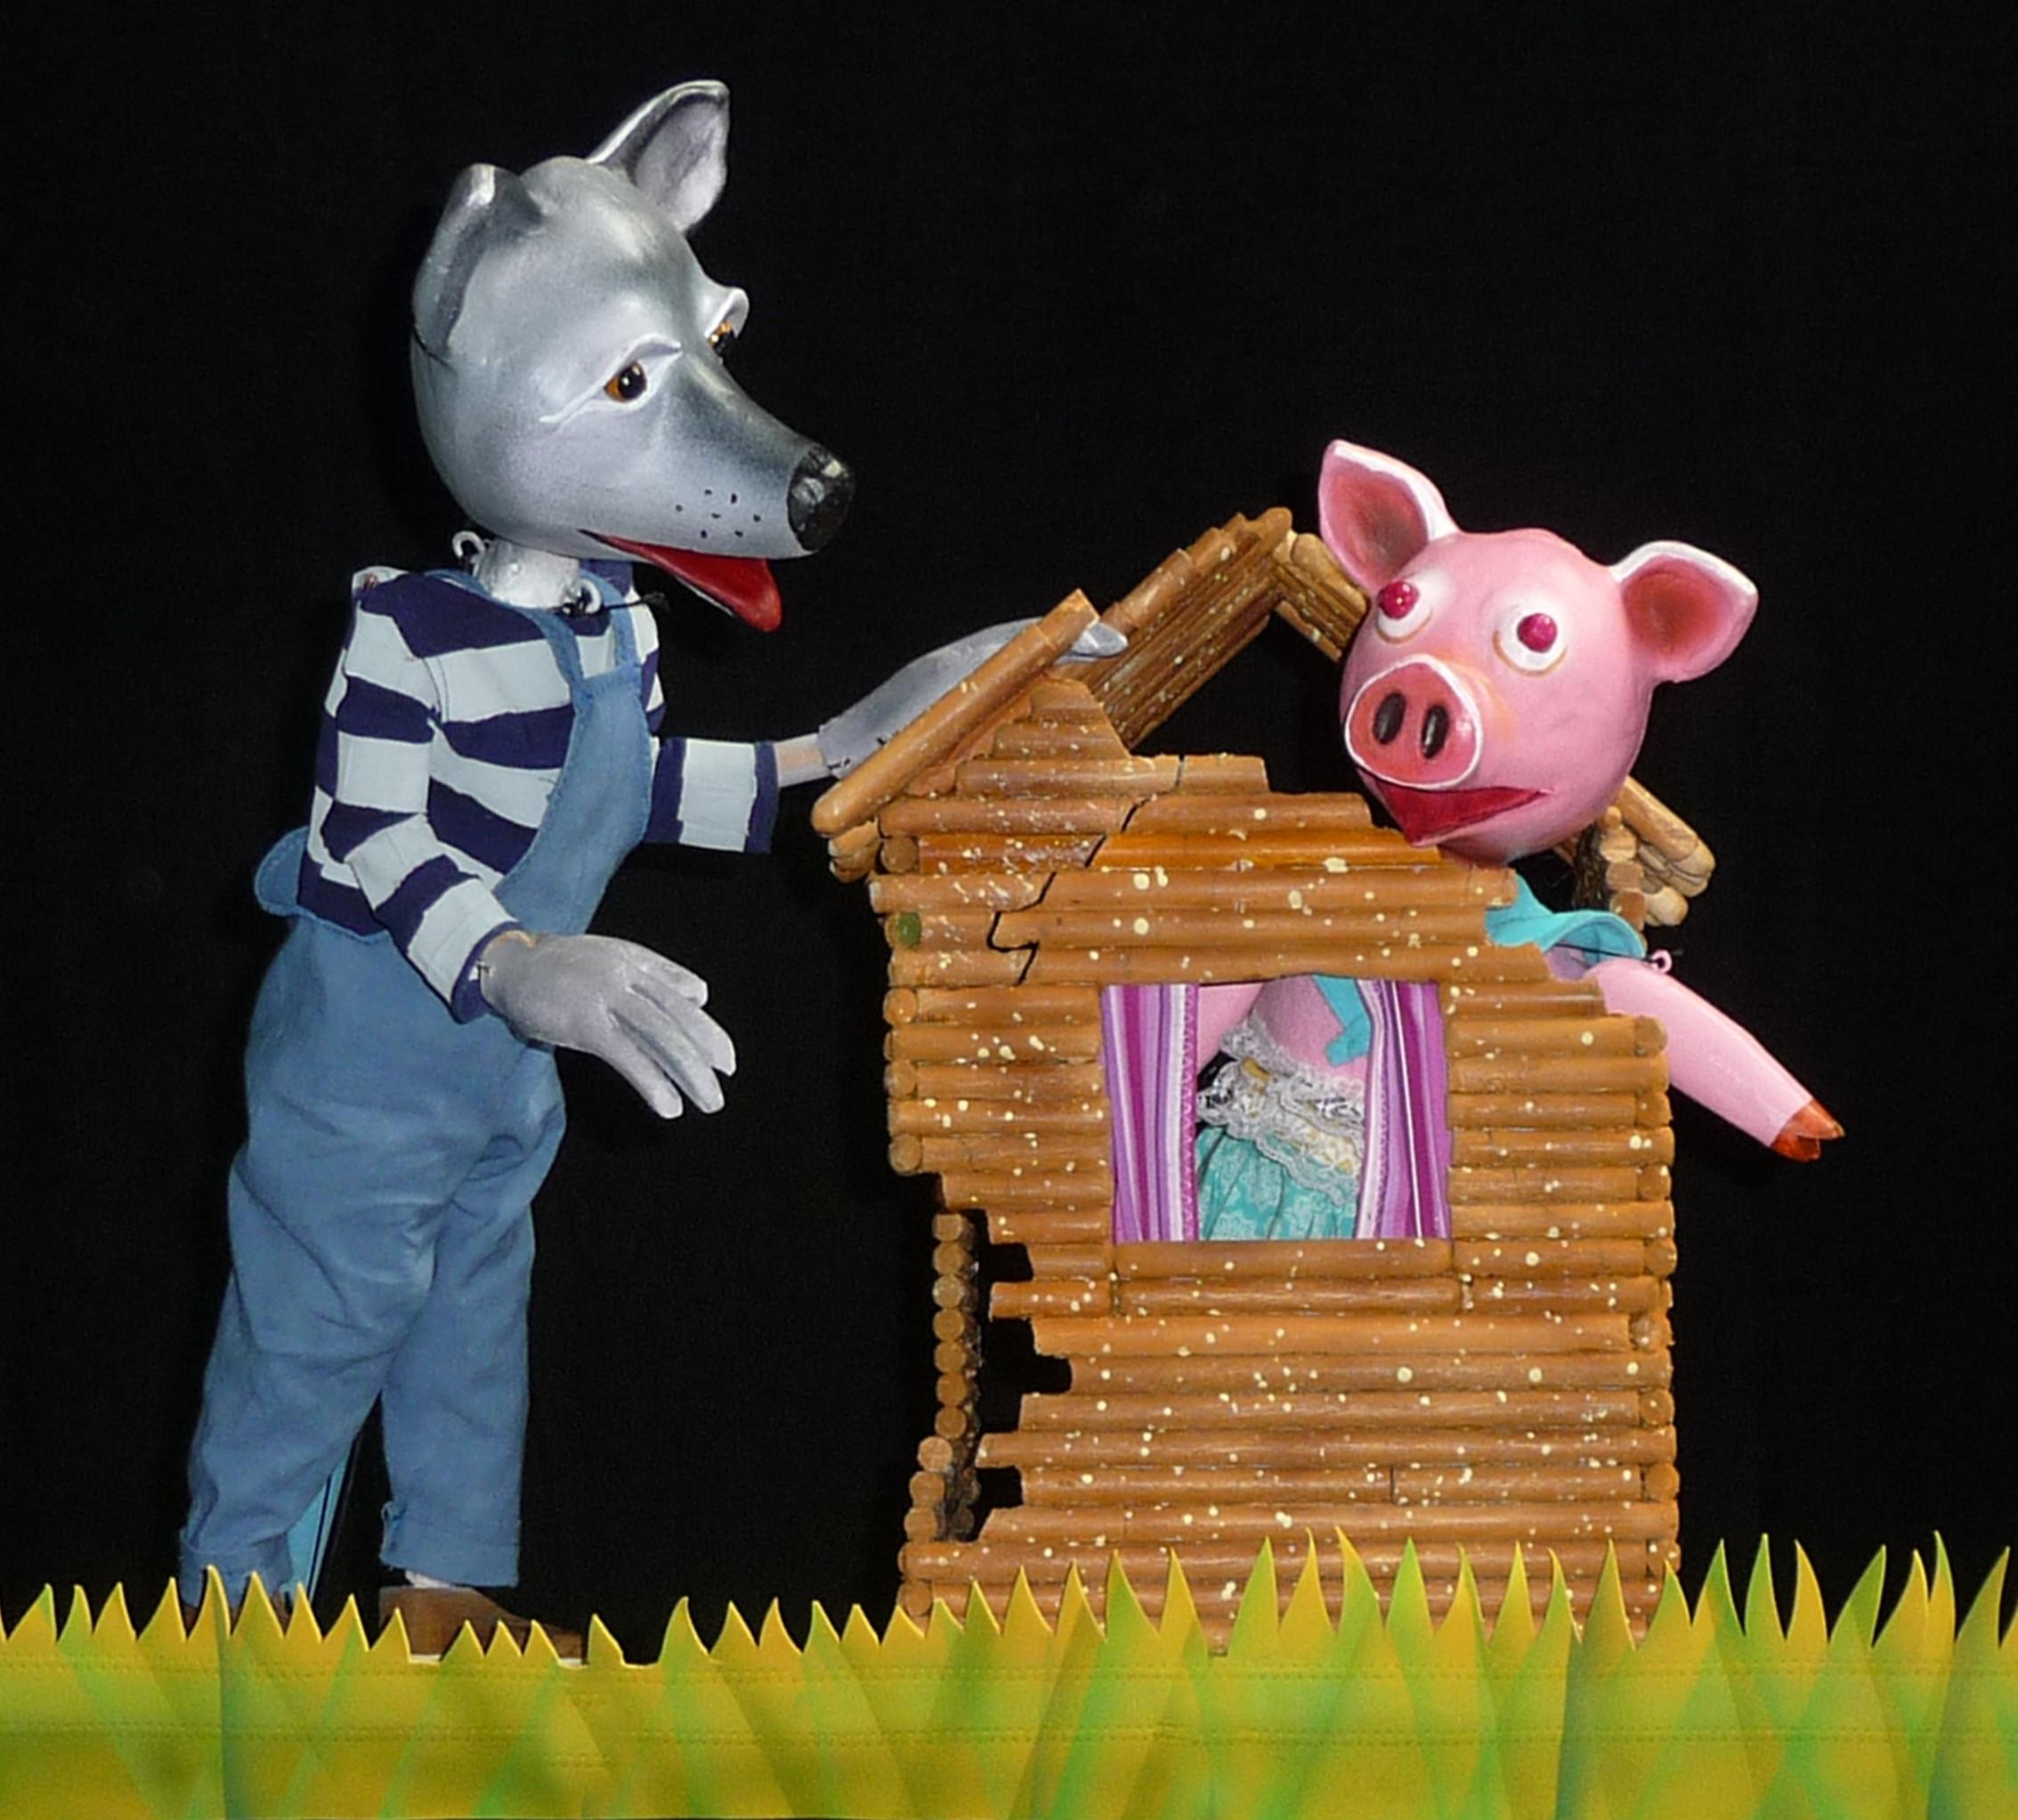 Three Little Pigs Program on April 25.